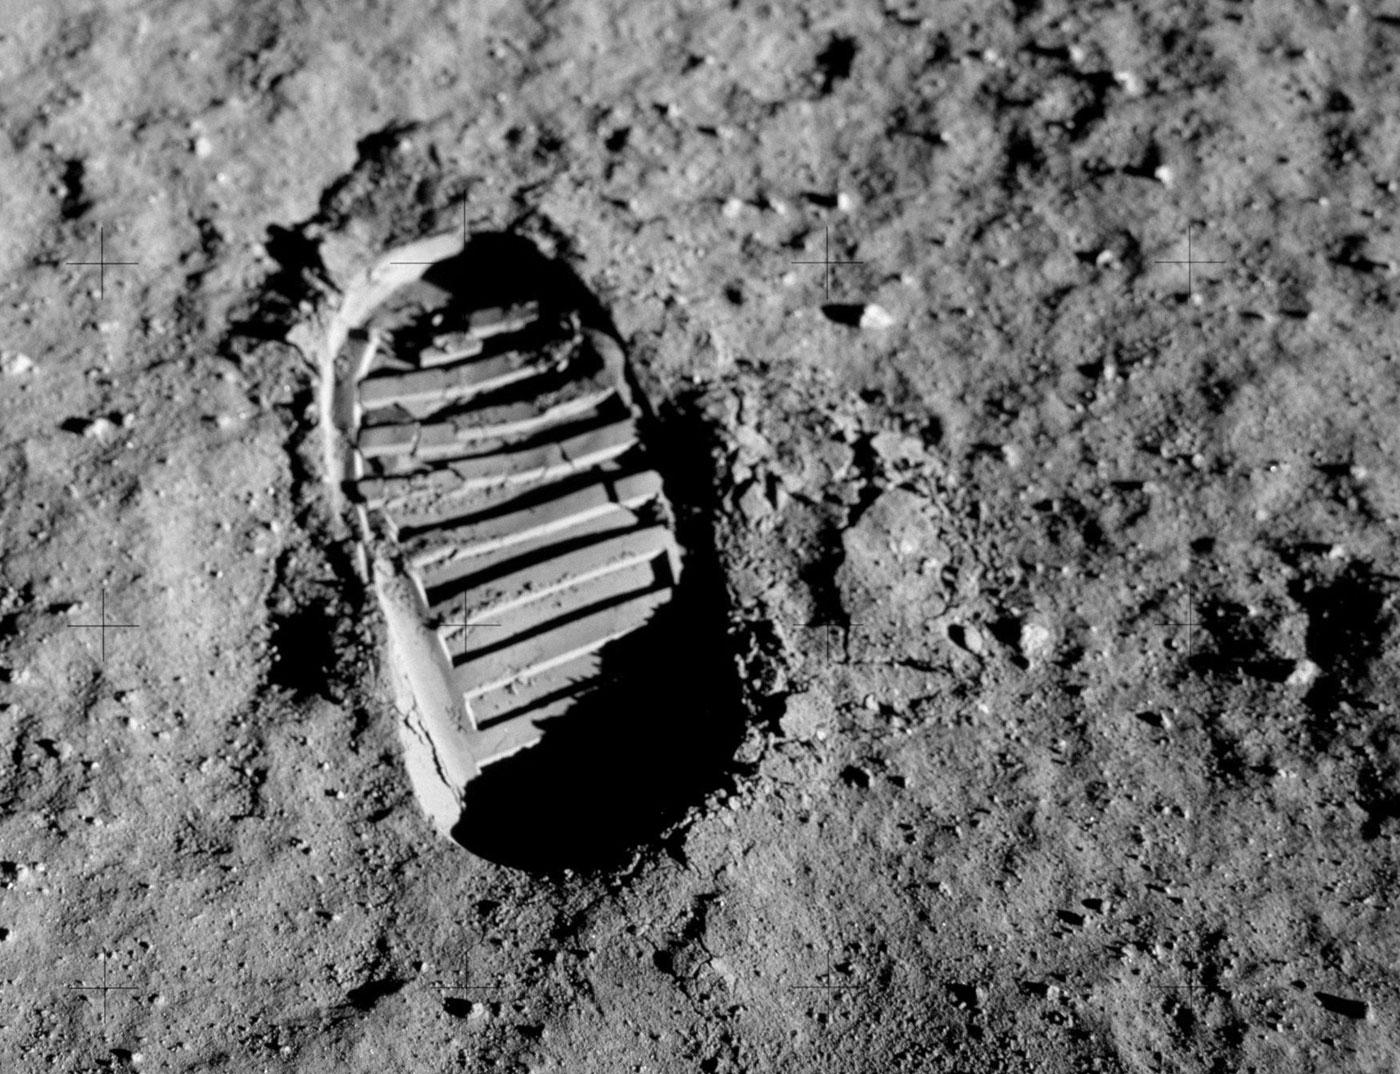 Apollo 11 bootprint